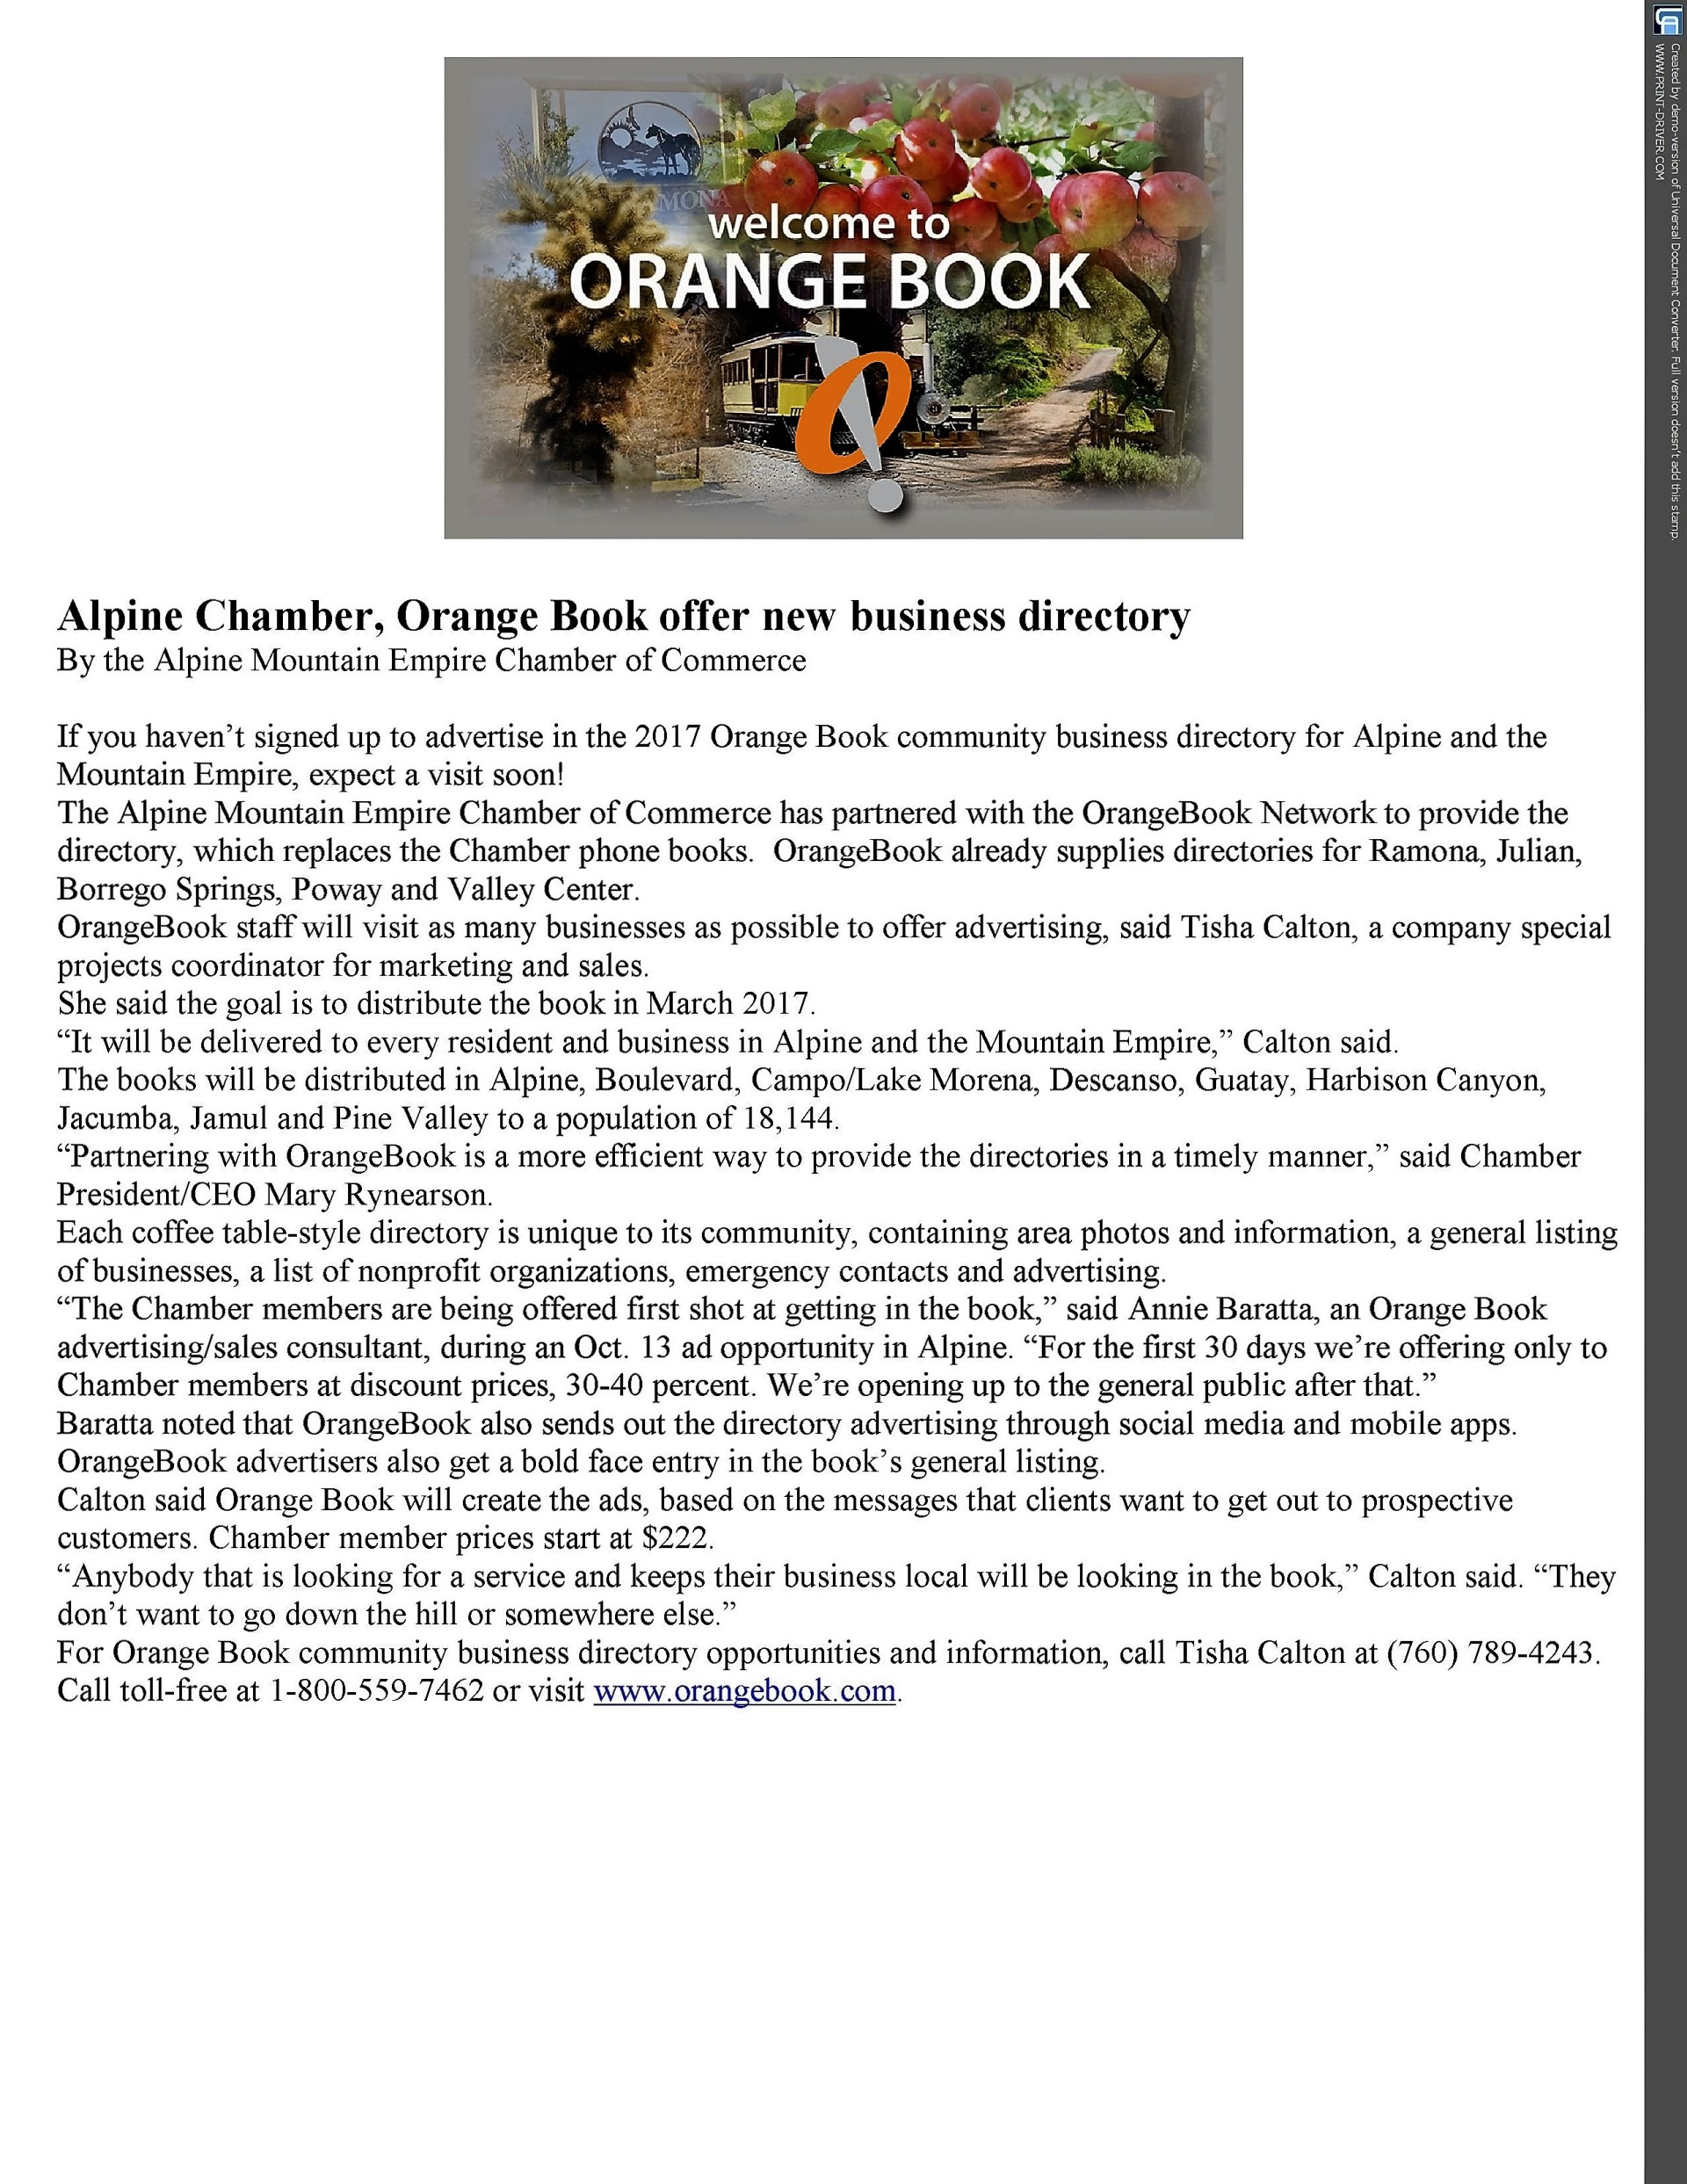 OJBk.FirstStory.Oct2016-(2)-w1920.jpg